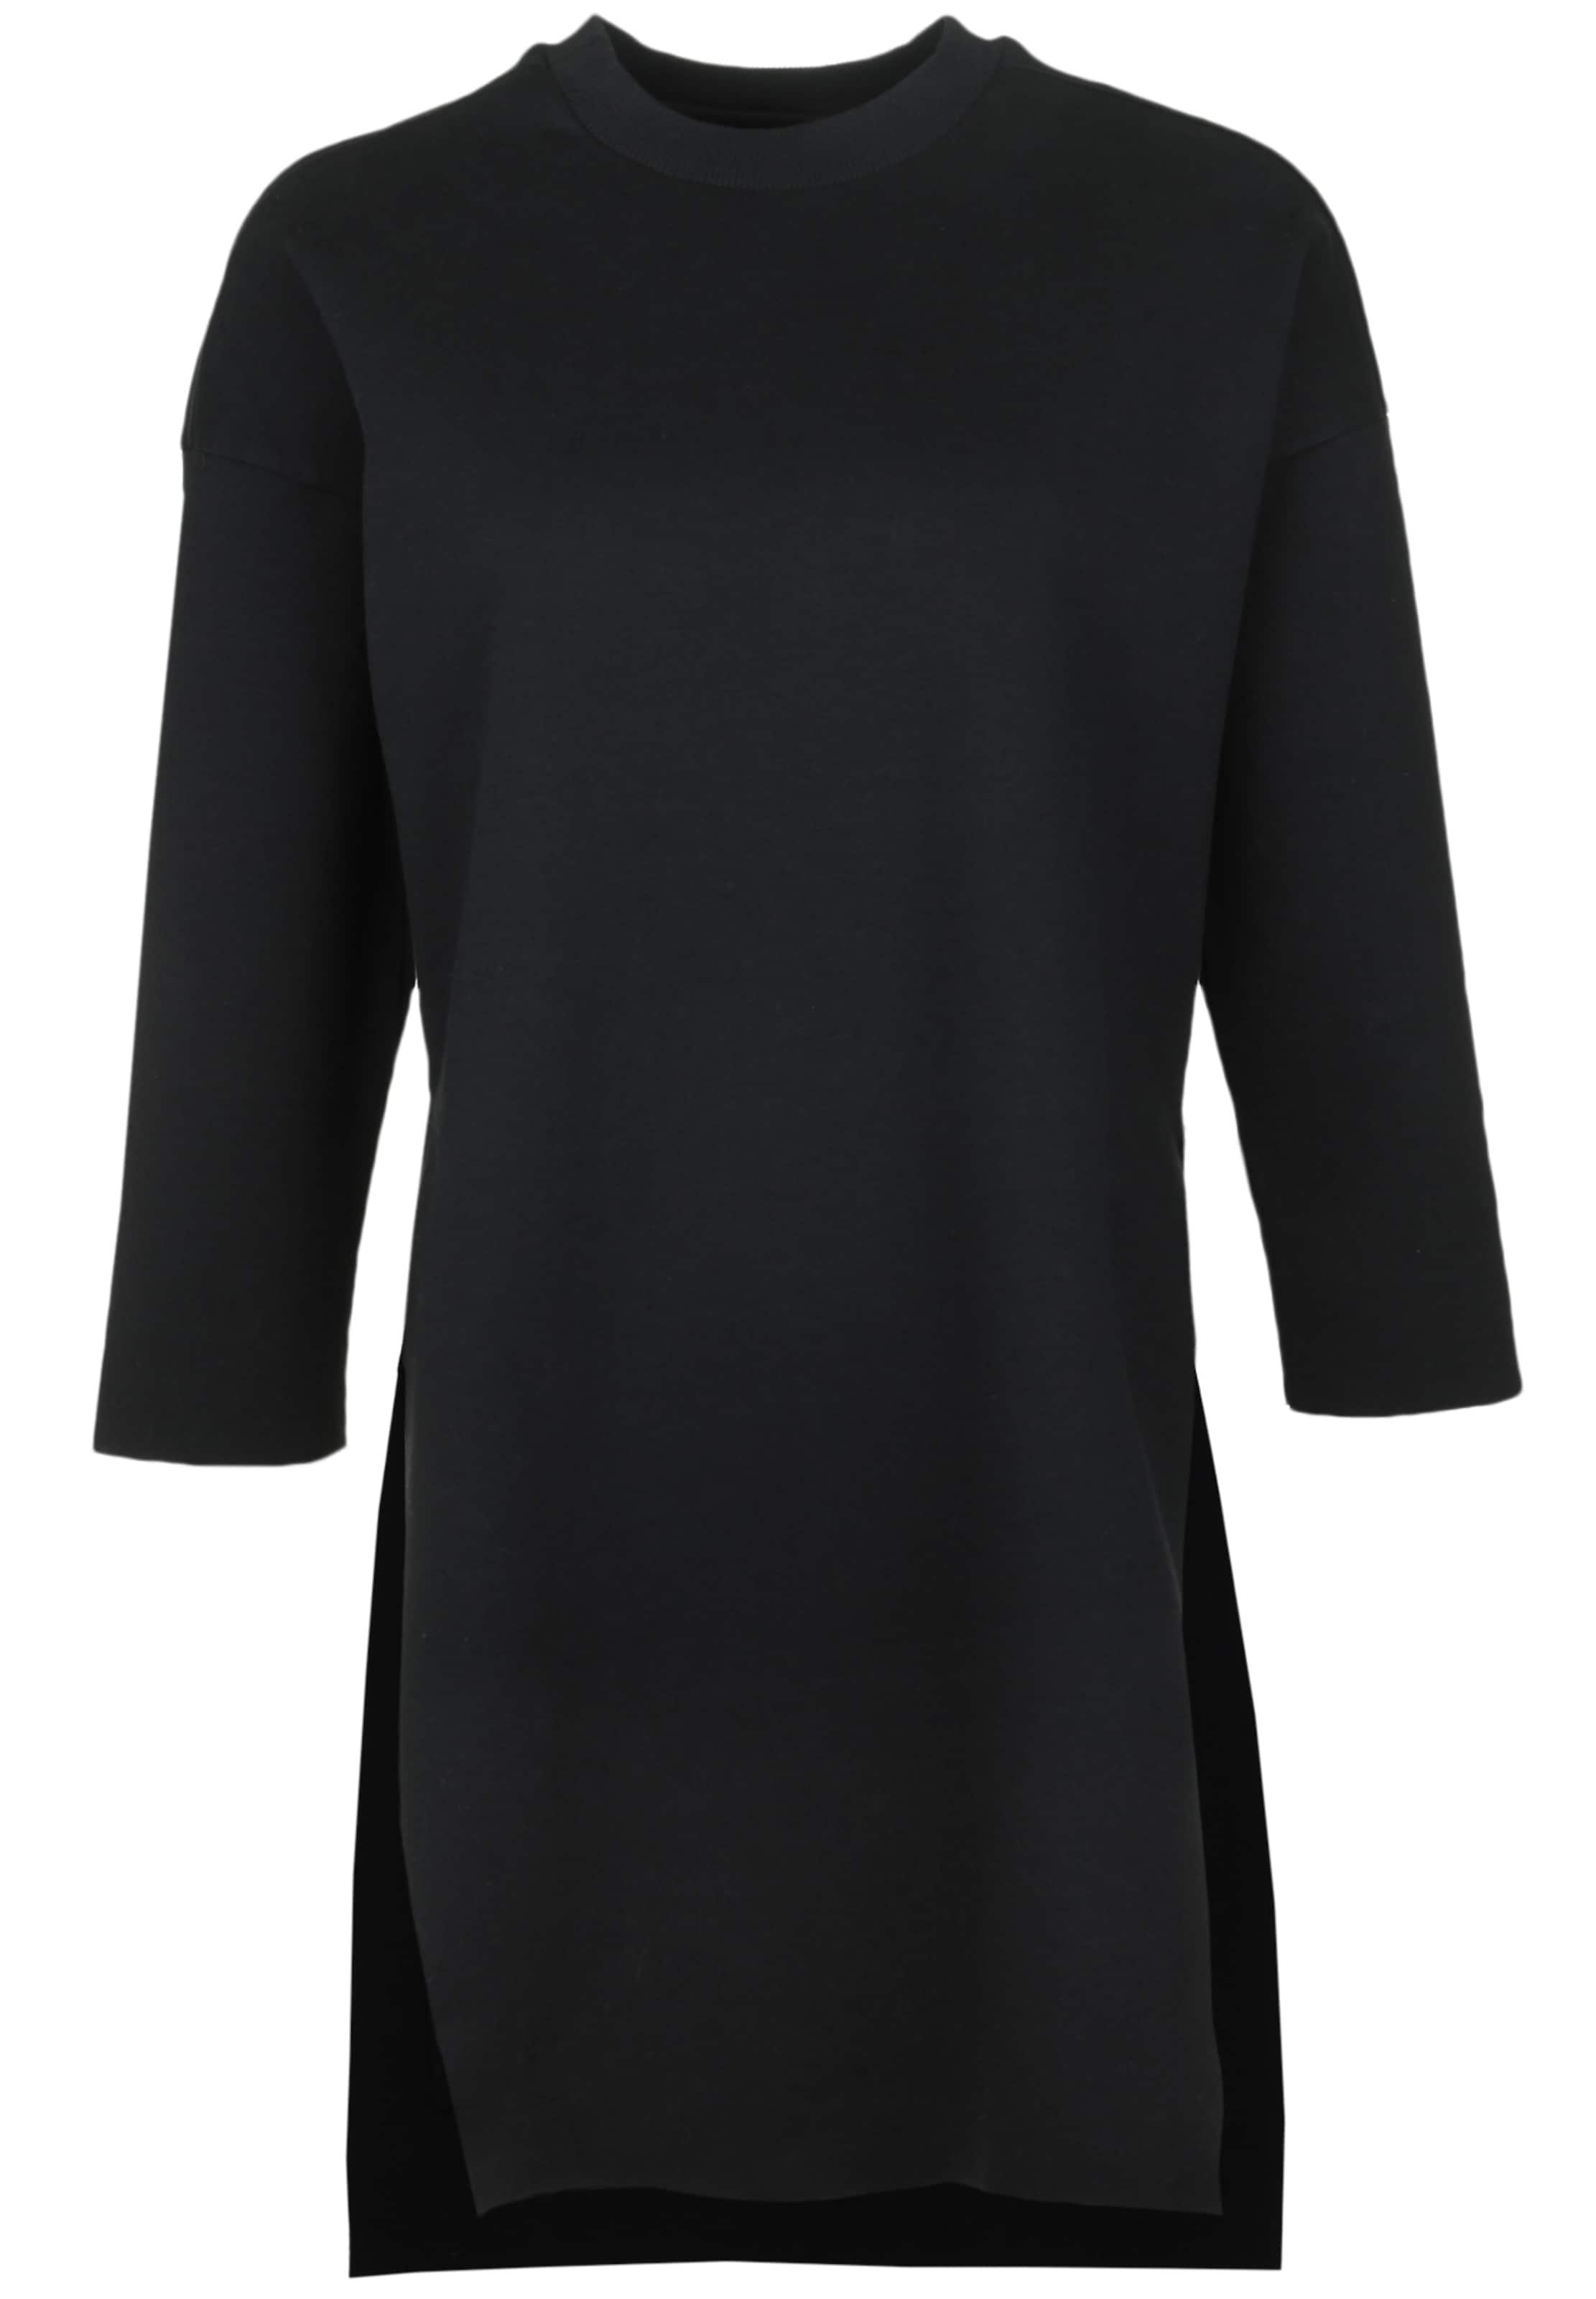 In DrDenim sweater 'rylen' Schwarz Long trshQCd